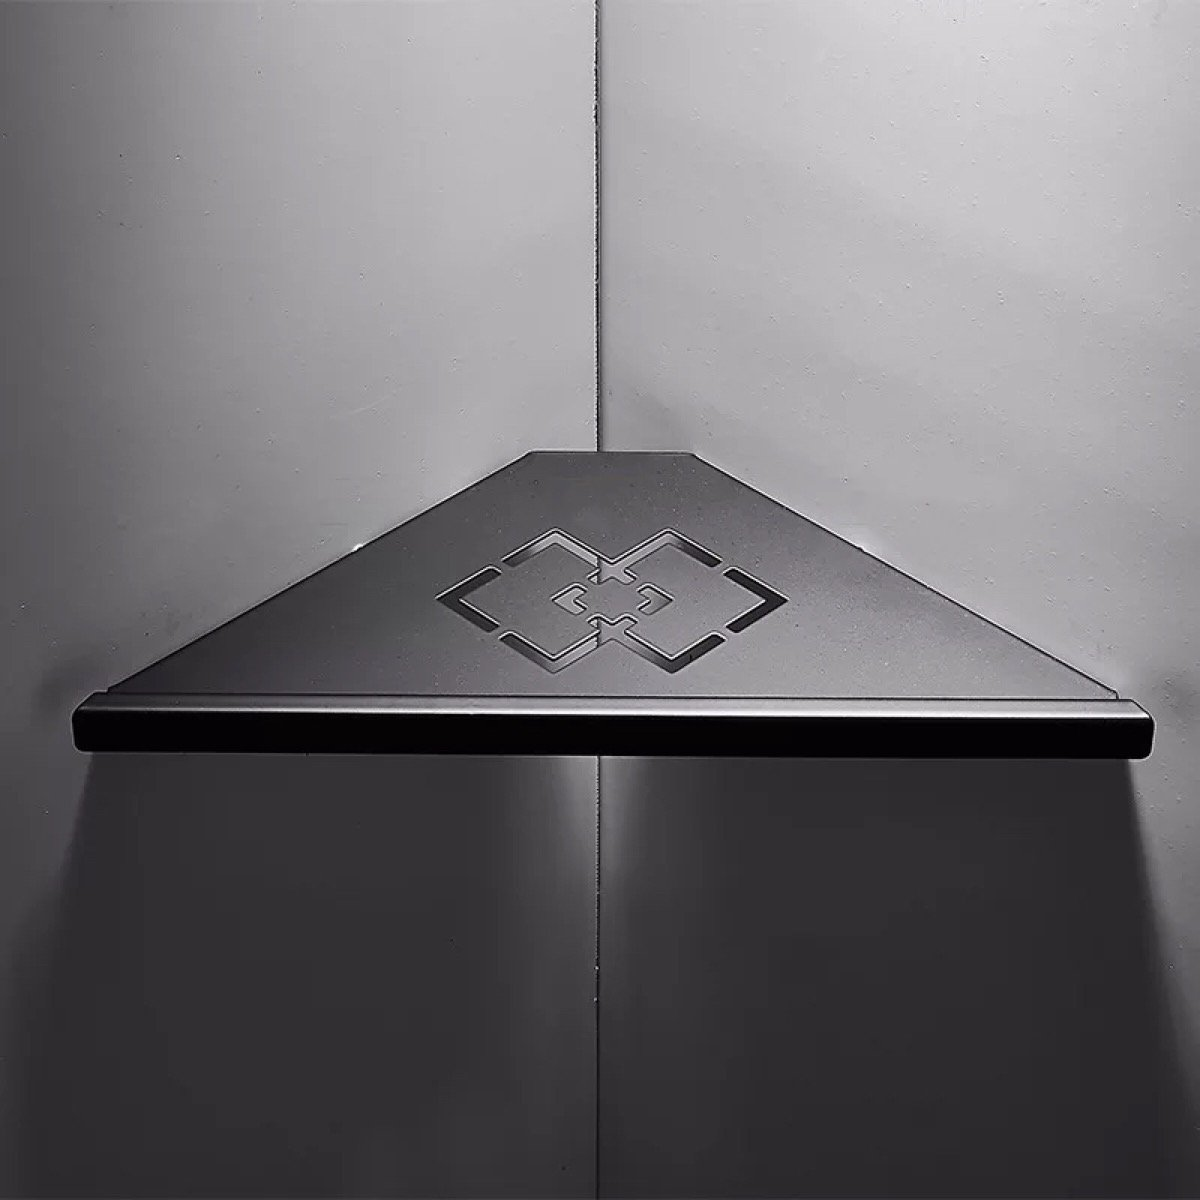 Ruddock YY7 Carved Hollow Out Black Matte Corner Shower Holder 304 Stainless Steel Bathroom Shelf (1 Layer)